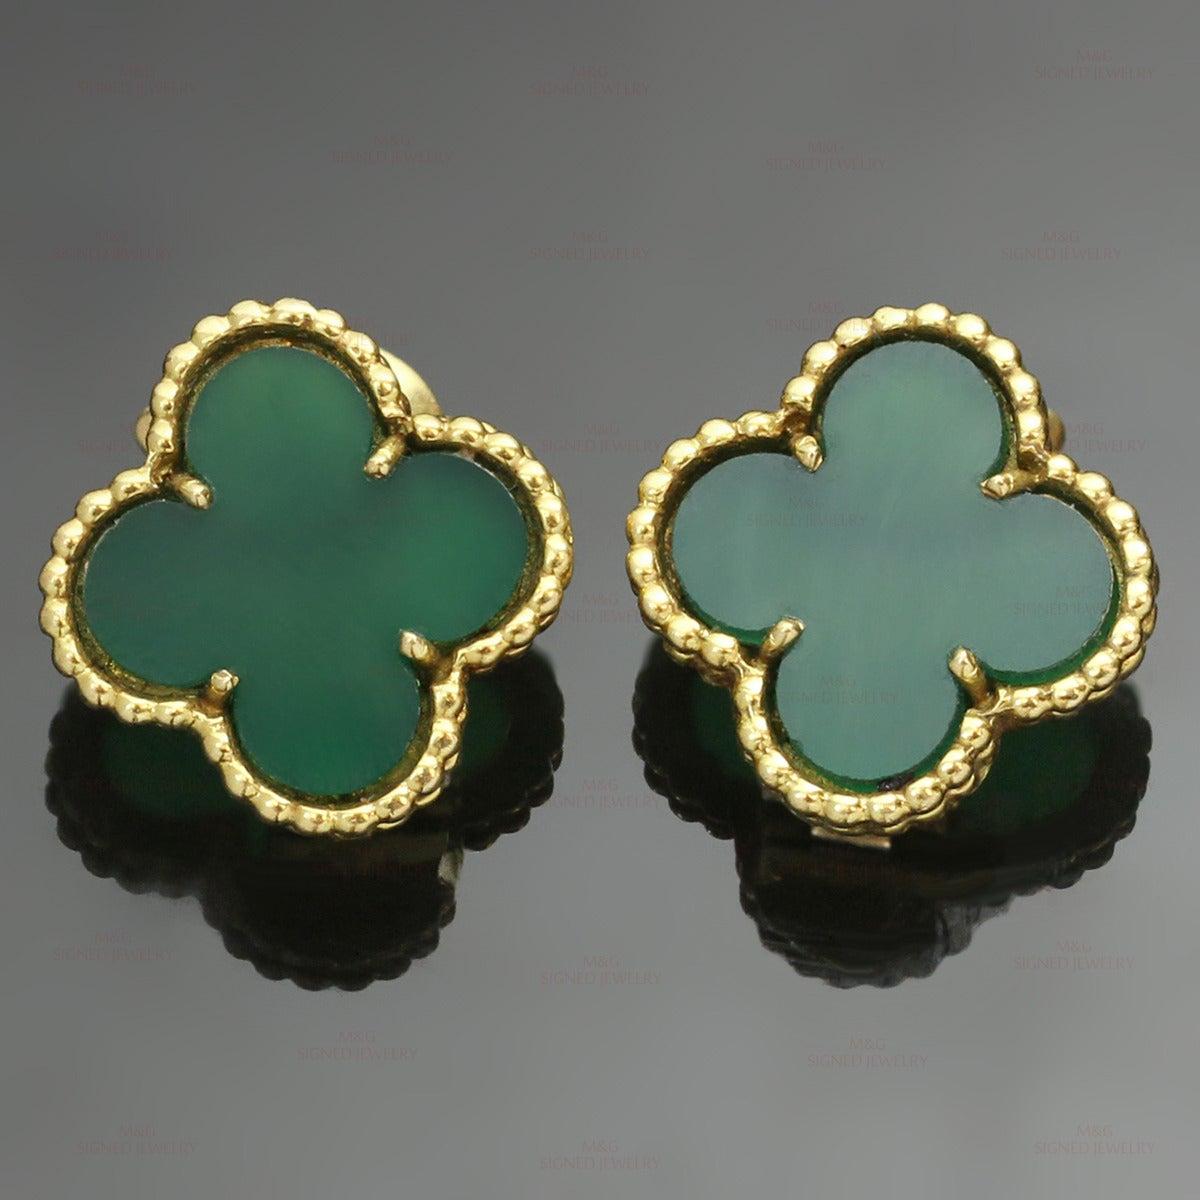 1970s Van Cleef & Arpels Alhambra Green Chalcedony Gold Earrings 6